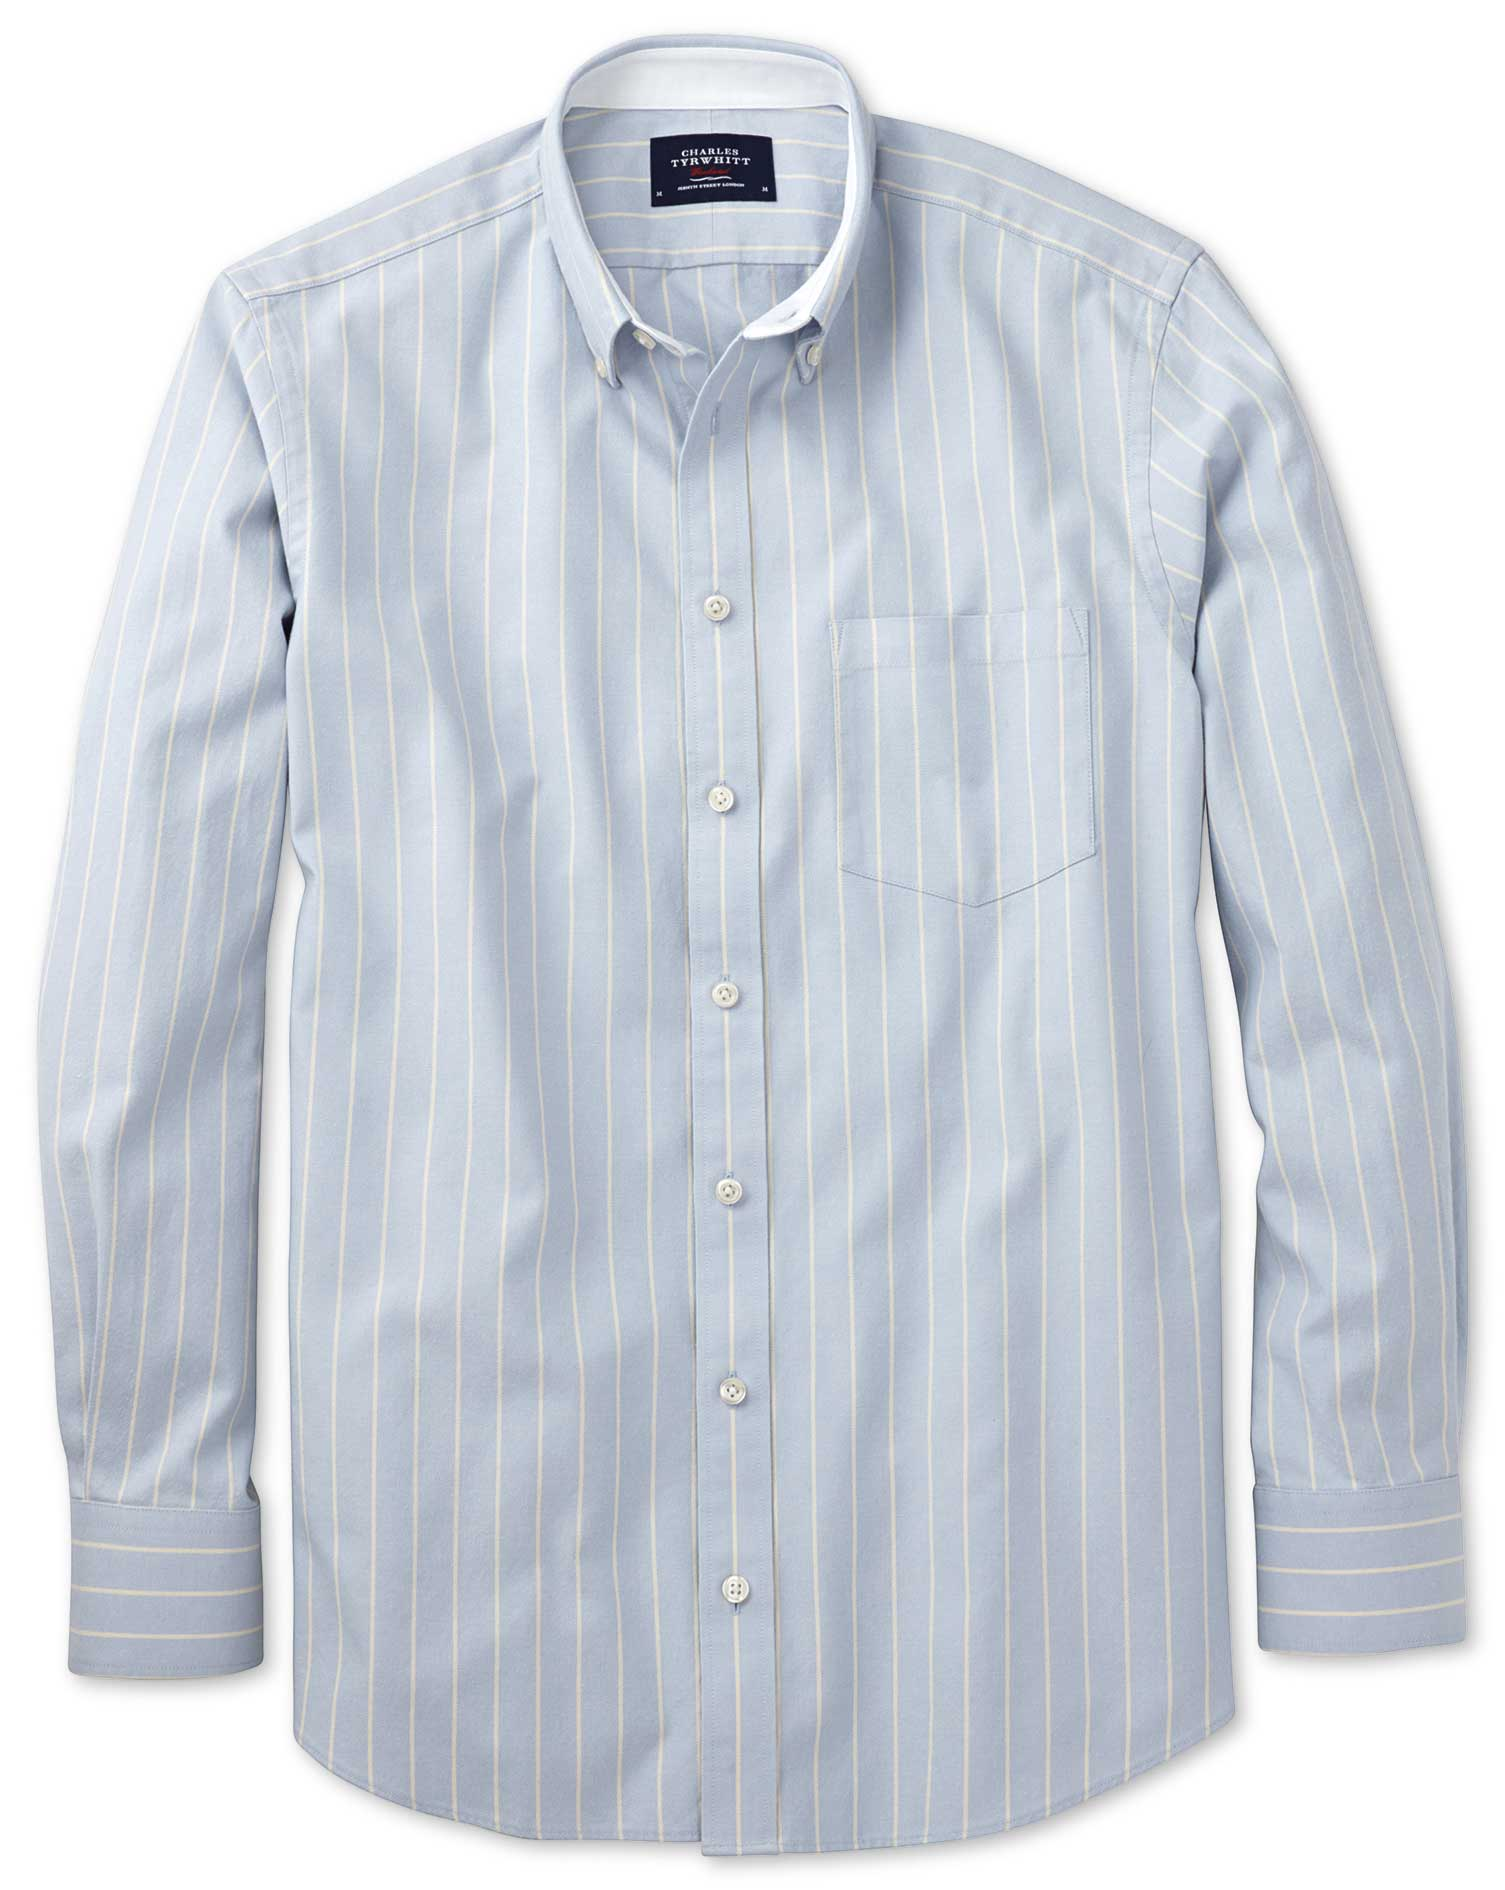 Slim Fit Sky Blue Stripe Washed Oxford Cotton Shirt Single Cuff Size Medium by Charles Tyrwhitt